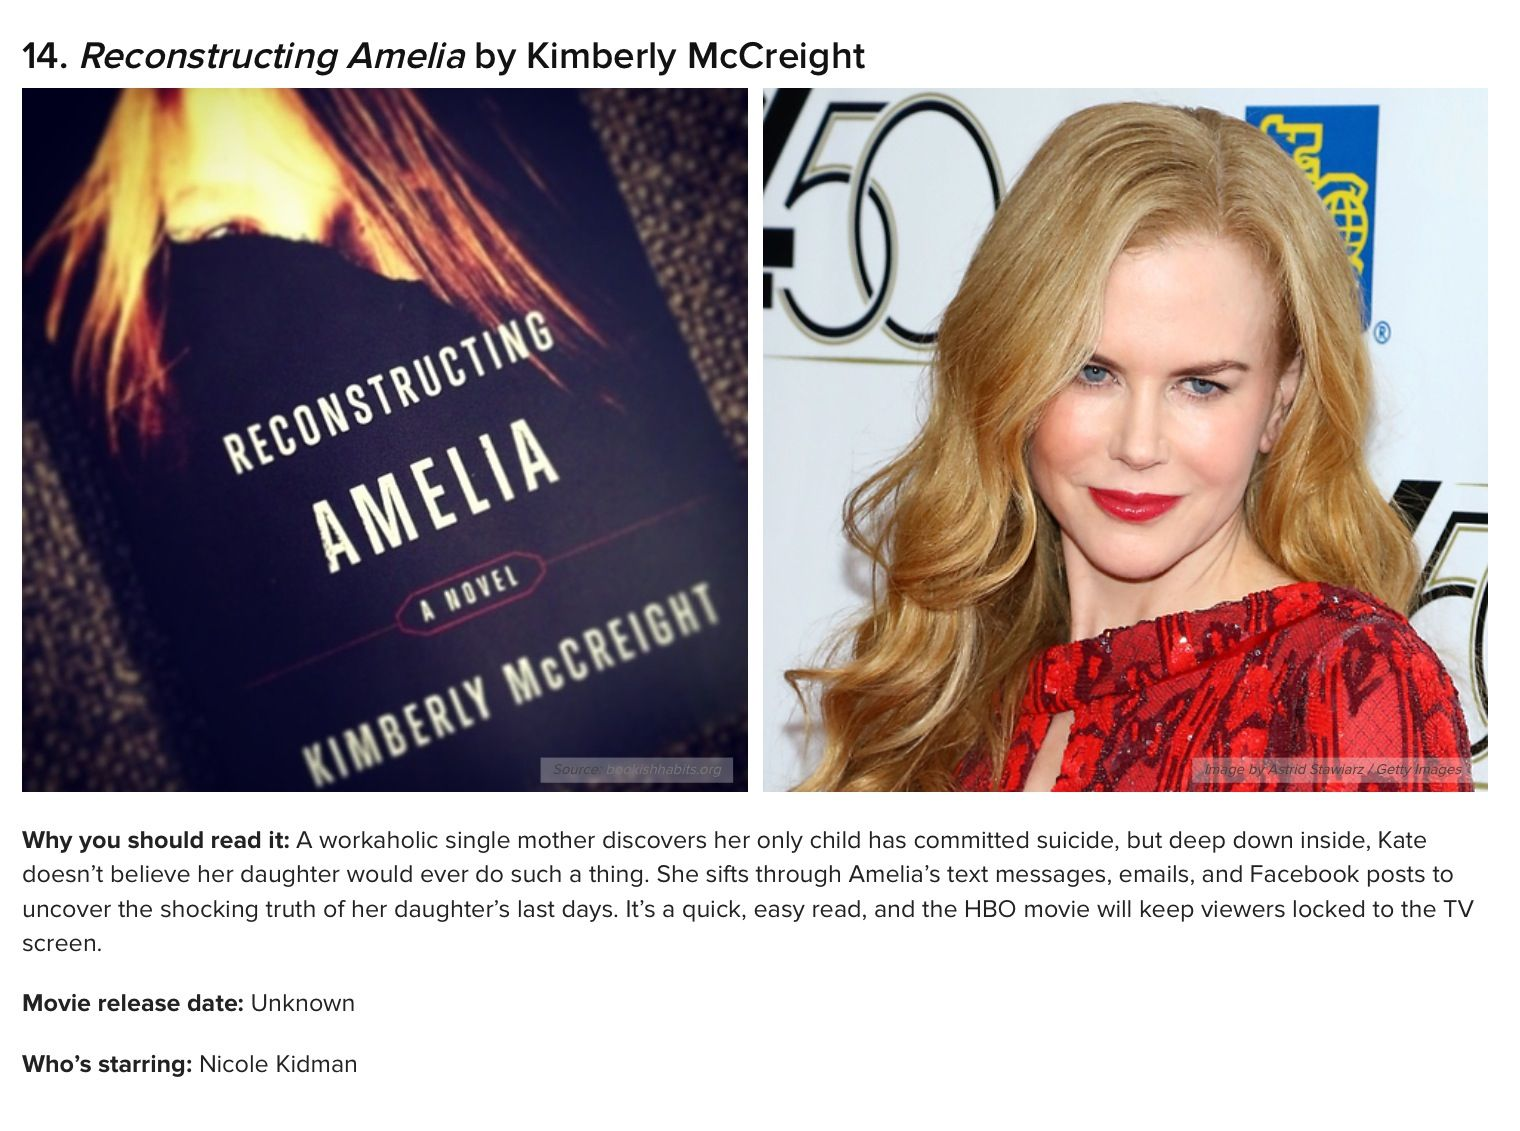 Reconstructing Amelia | Books to read | Pinterest